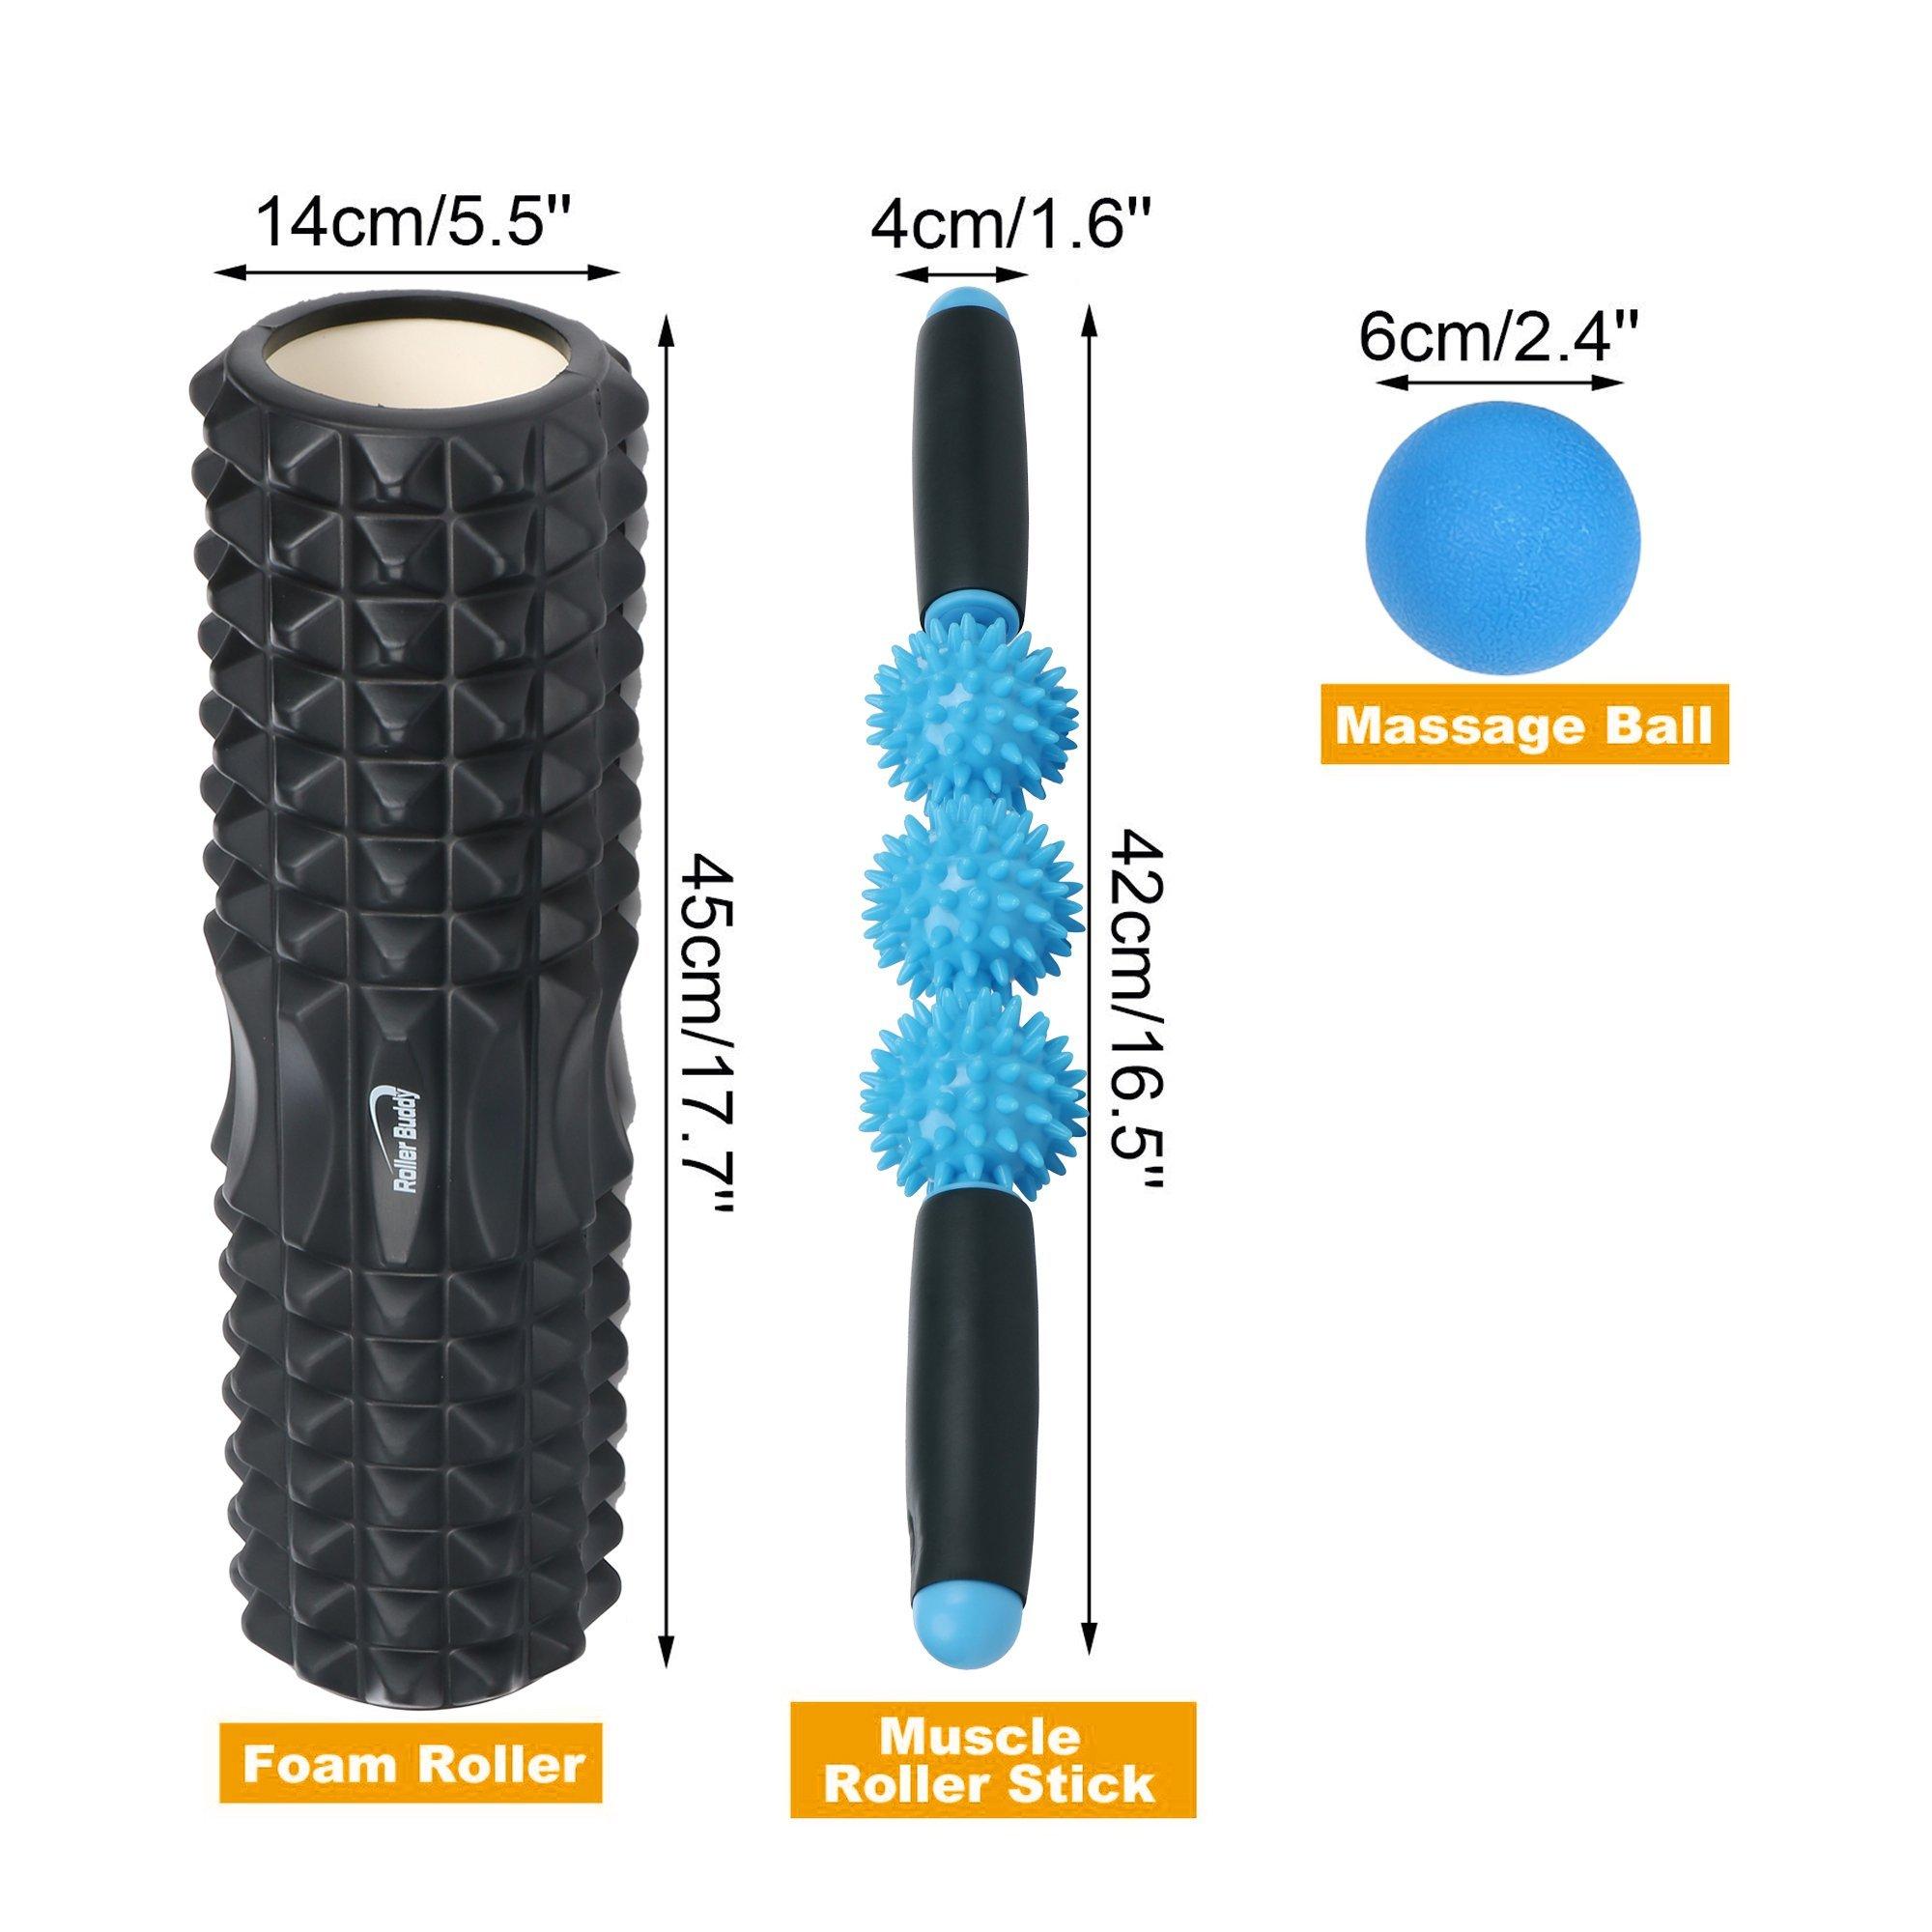 Muscle Massage Foam Roller Kit Back Massager Roller - 4 in 1 Best Trigger Point Massage Tool Lacrosse Roller Ball Massager Stick by Roller Buddy (Image #2)